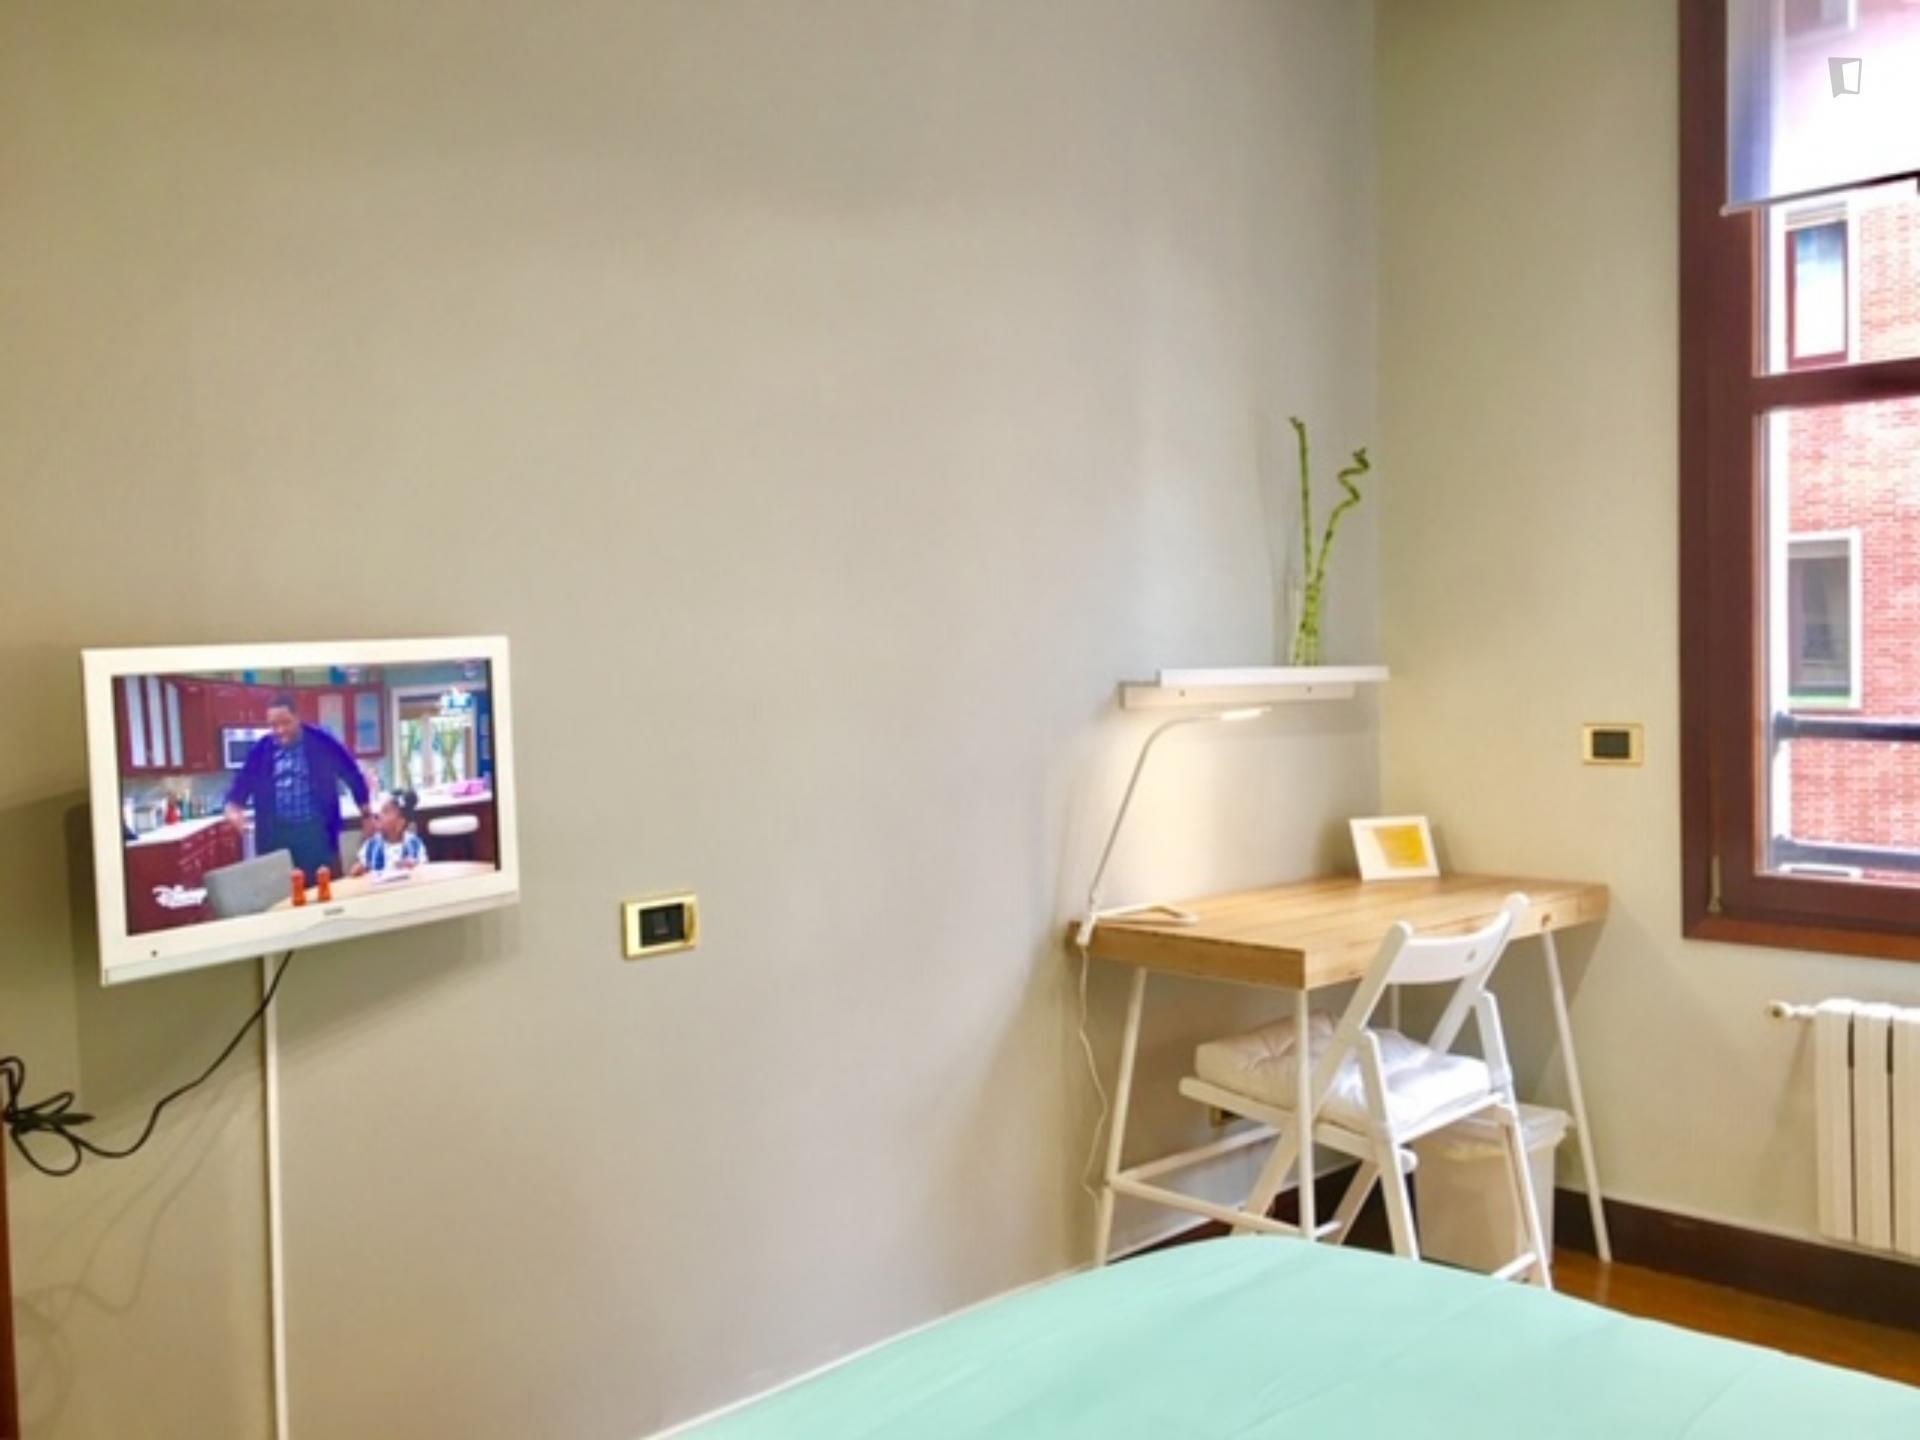 Parra - Furnished bedroom in Bilbao